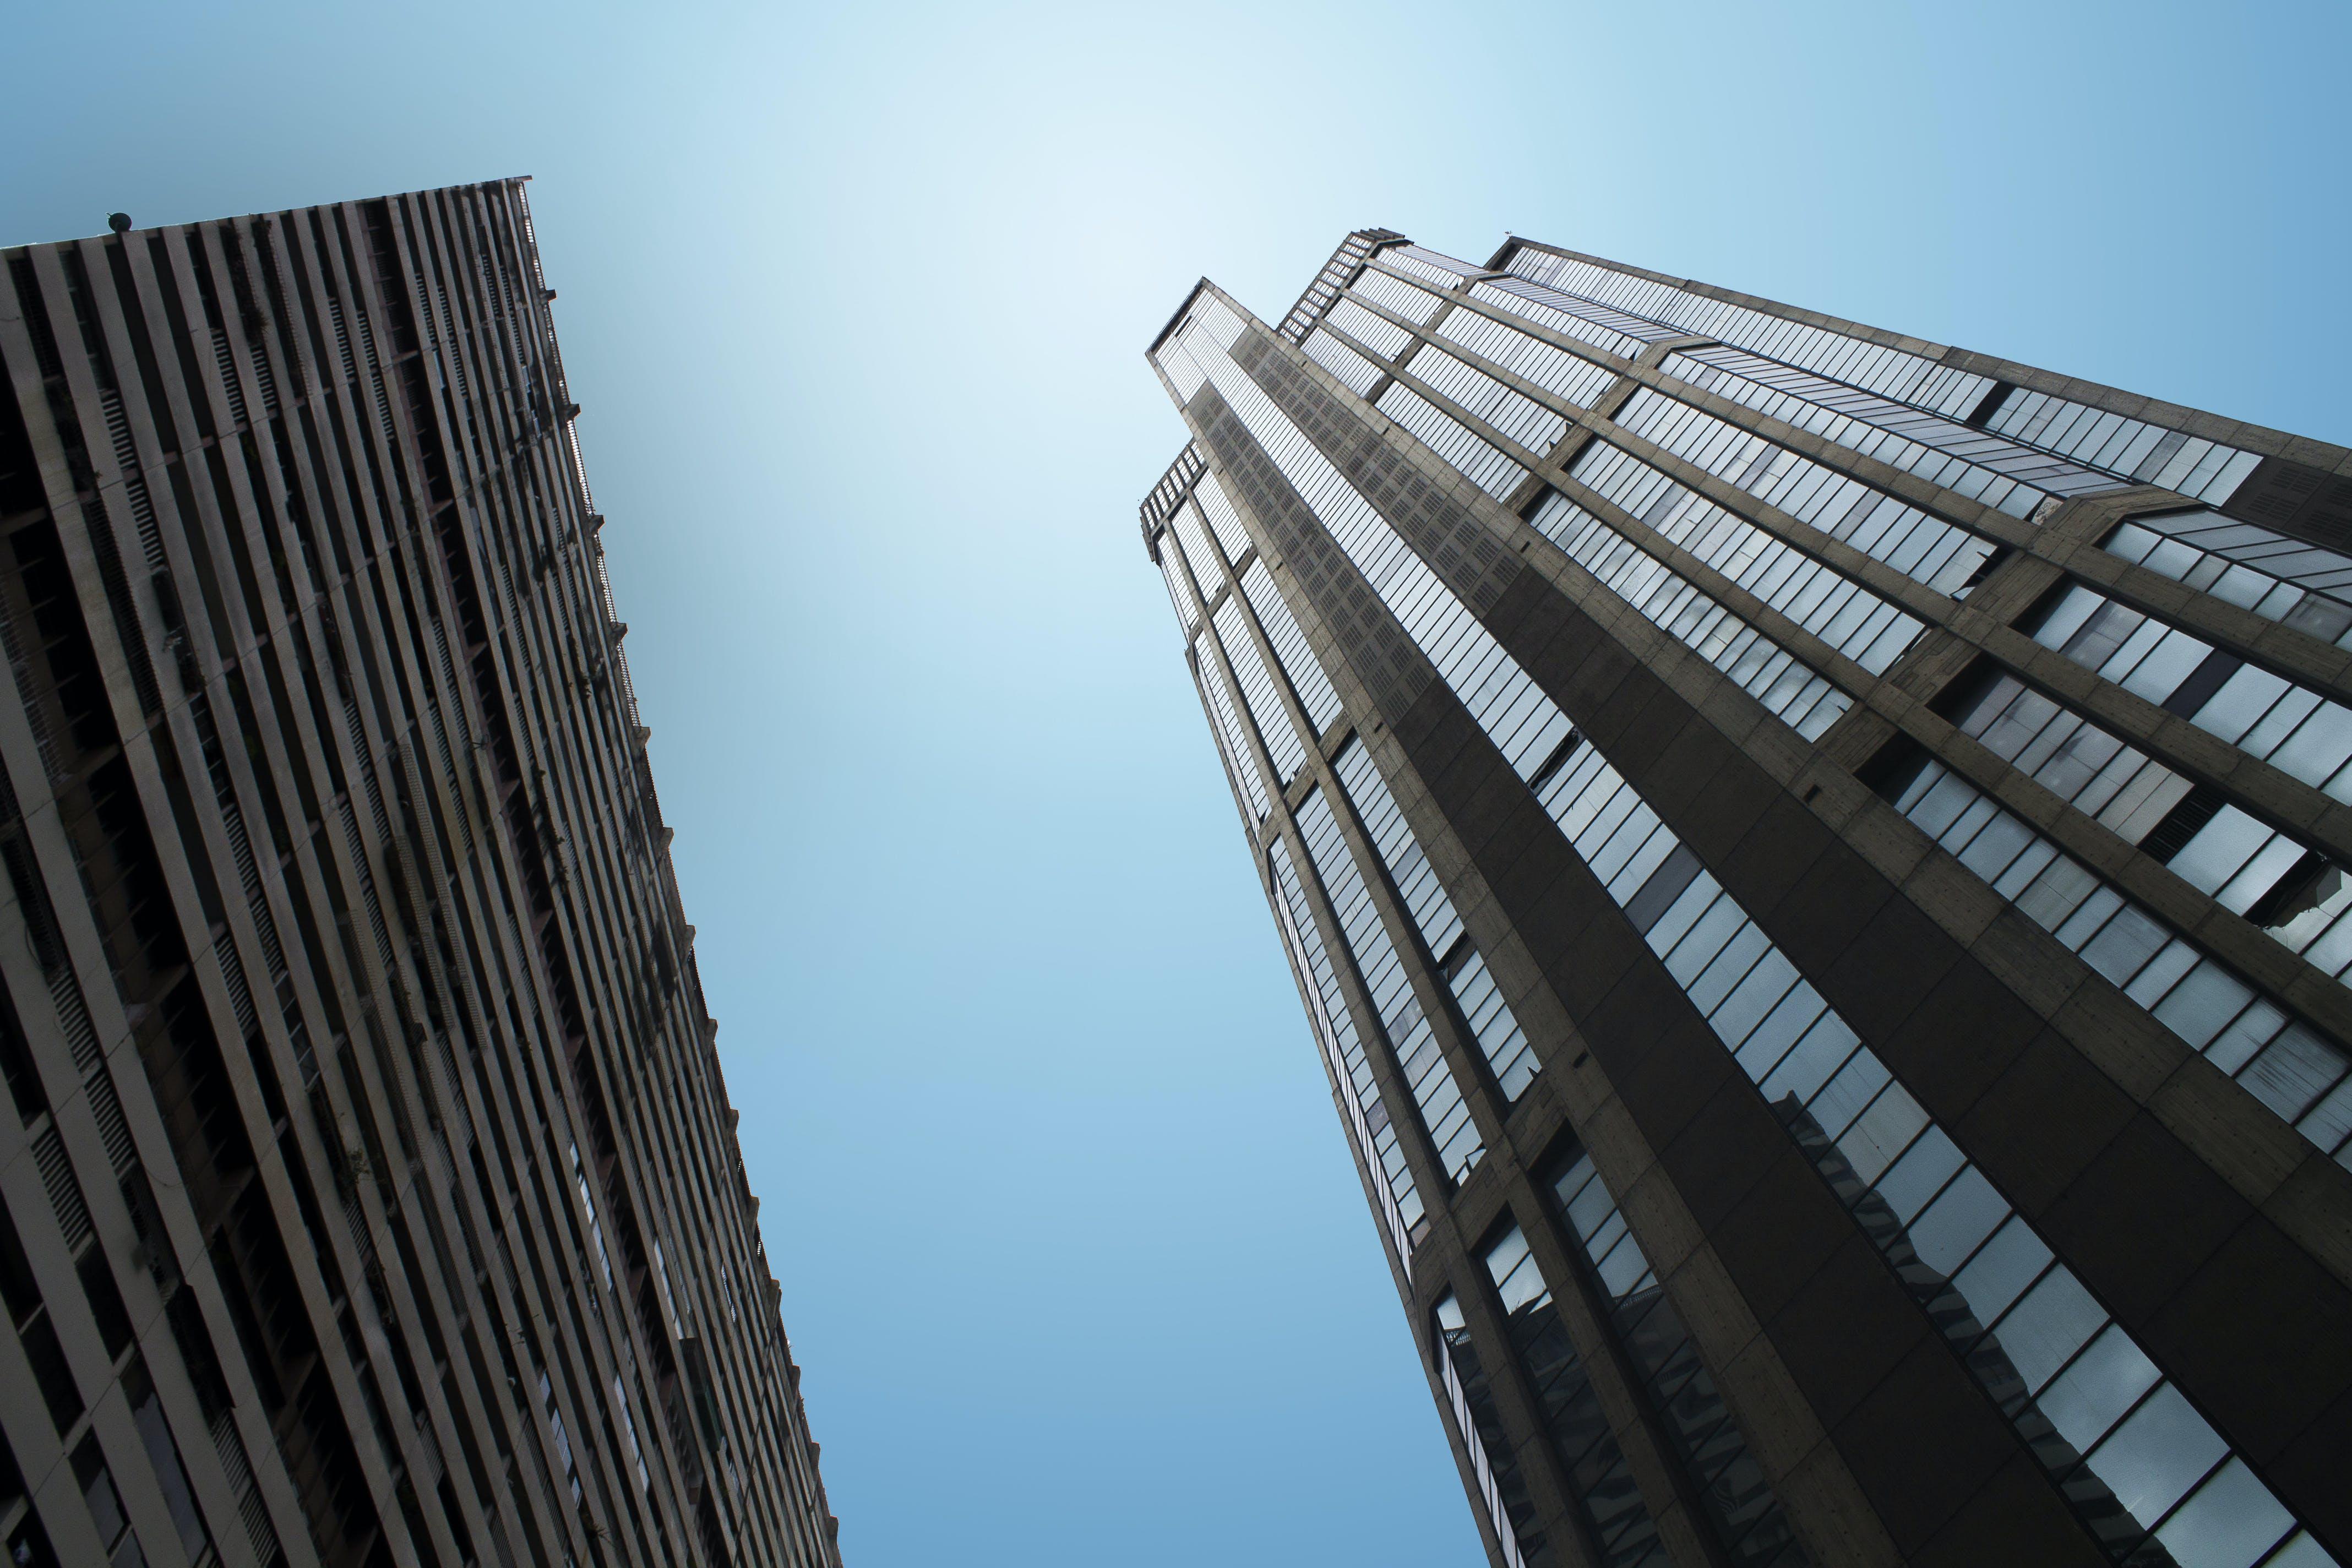 Gratis arkivbilde med arkitektonisk design, arkitektoniske detaljer, arkitektur, blå himmel